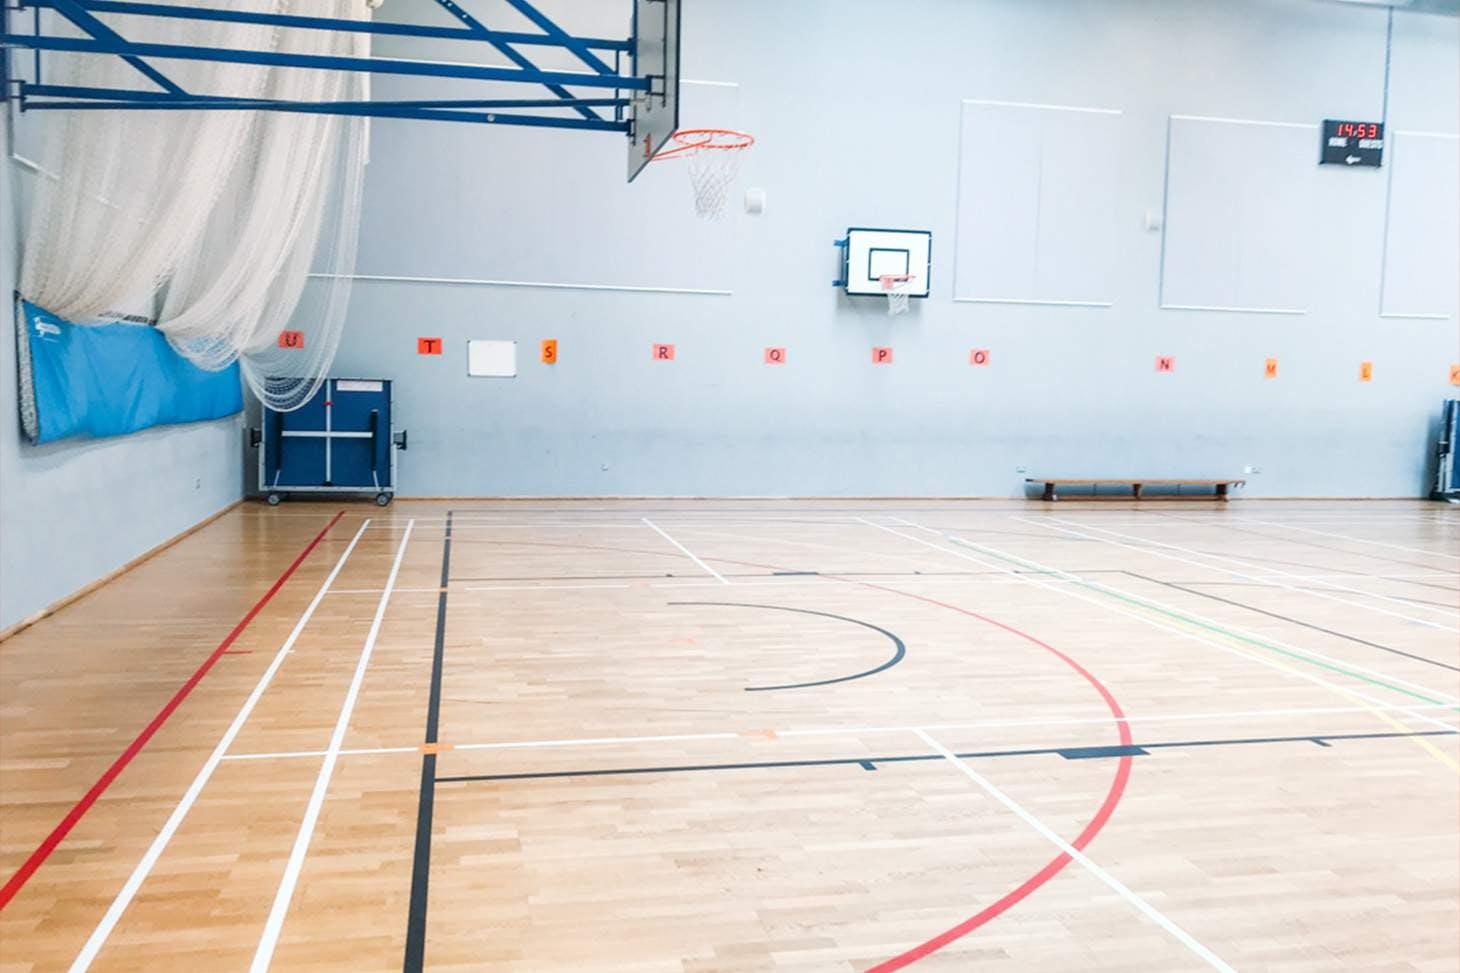 St Paul's Way Trust School Nets | Sports hall cricket facilities